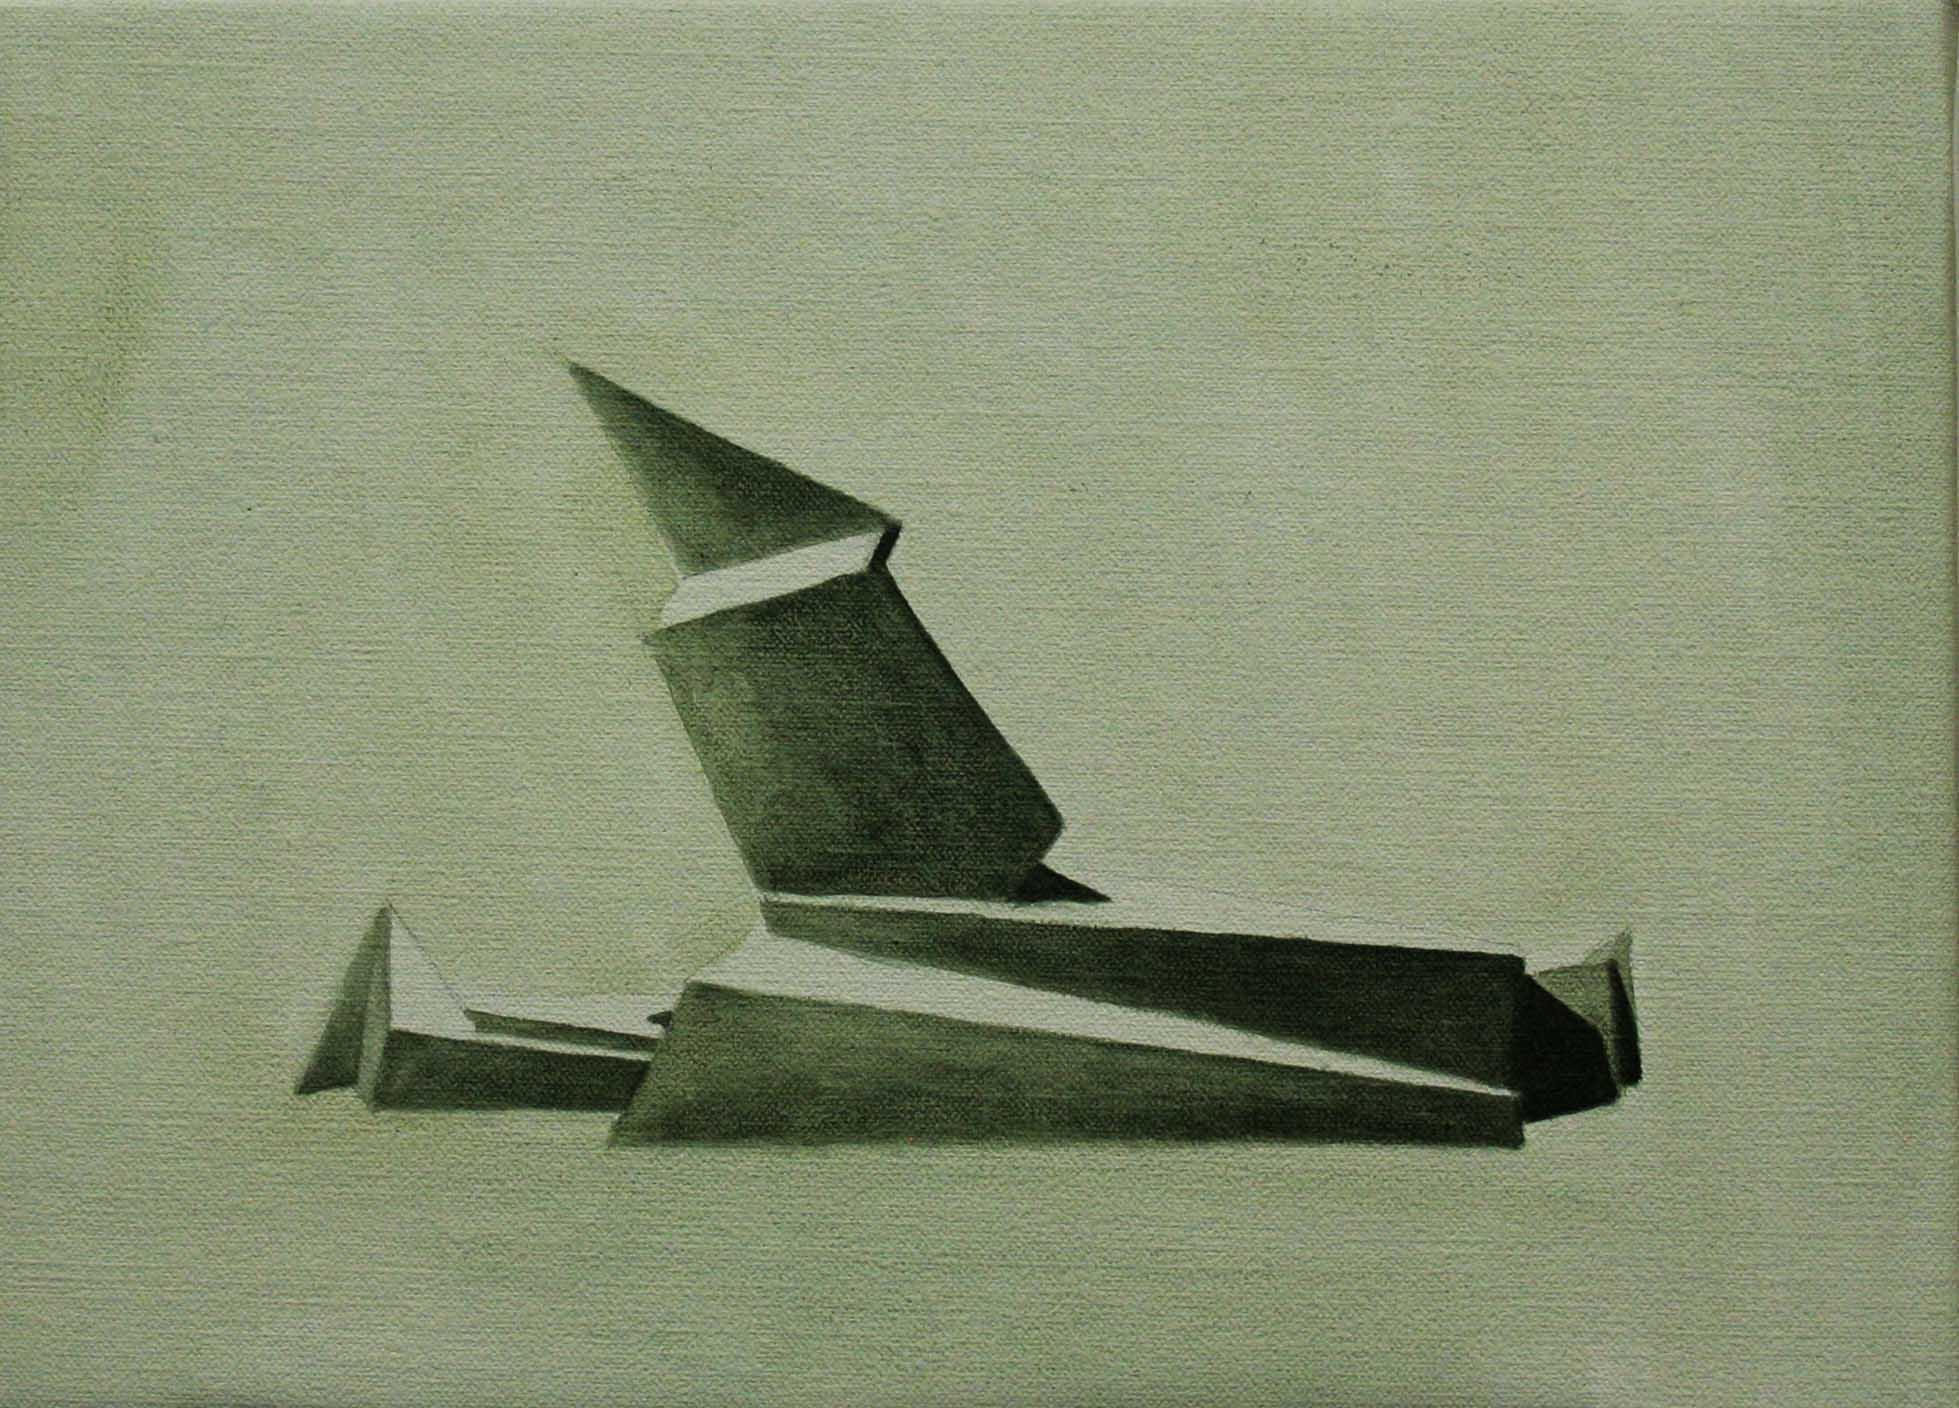 003-GE2013